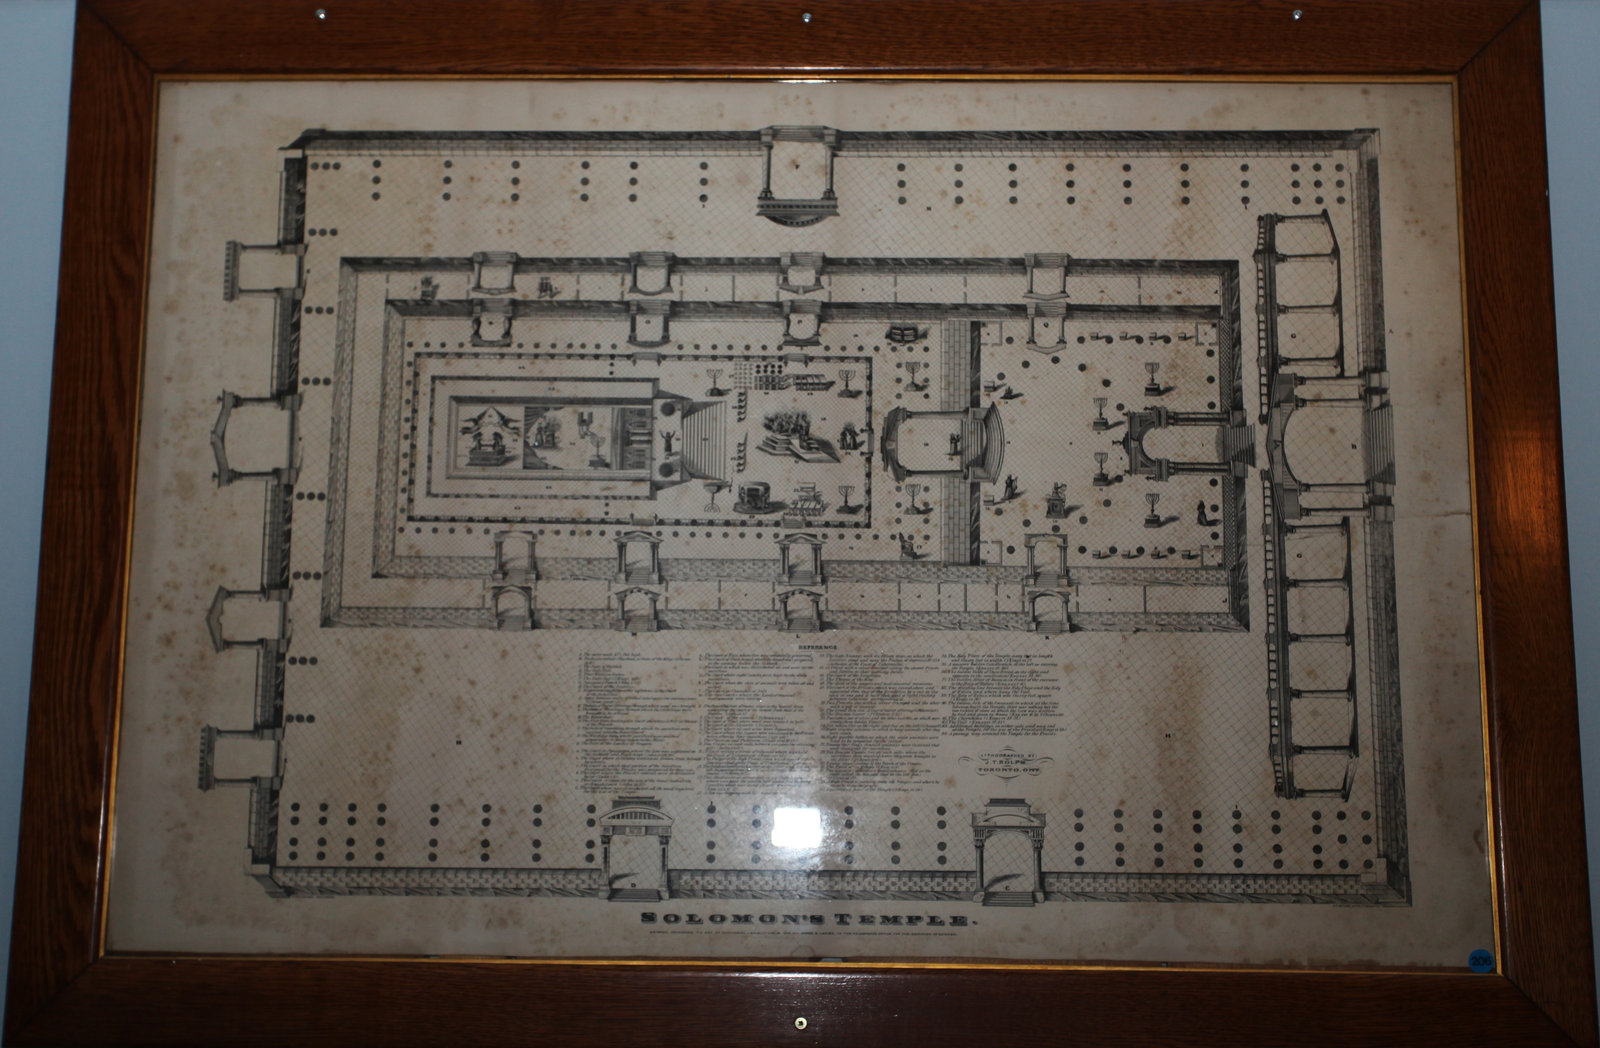 Plan of Solomon's Temple